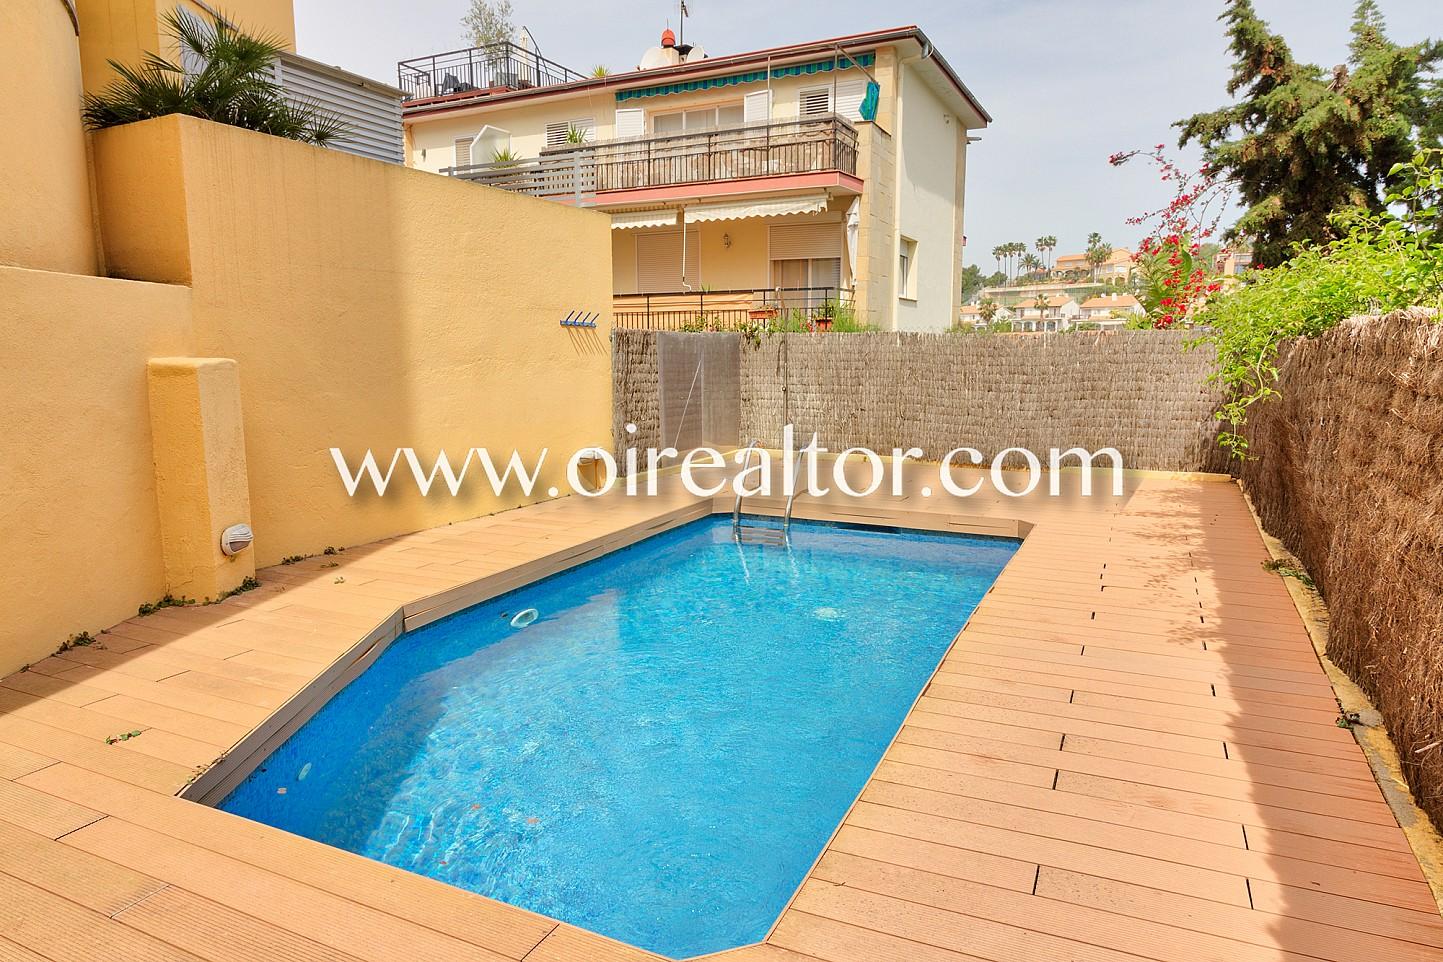 Precioso piso con piscina en vallpineda sitges oi realtor for Piscina sitges